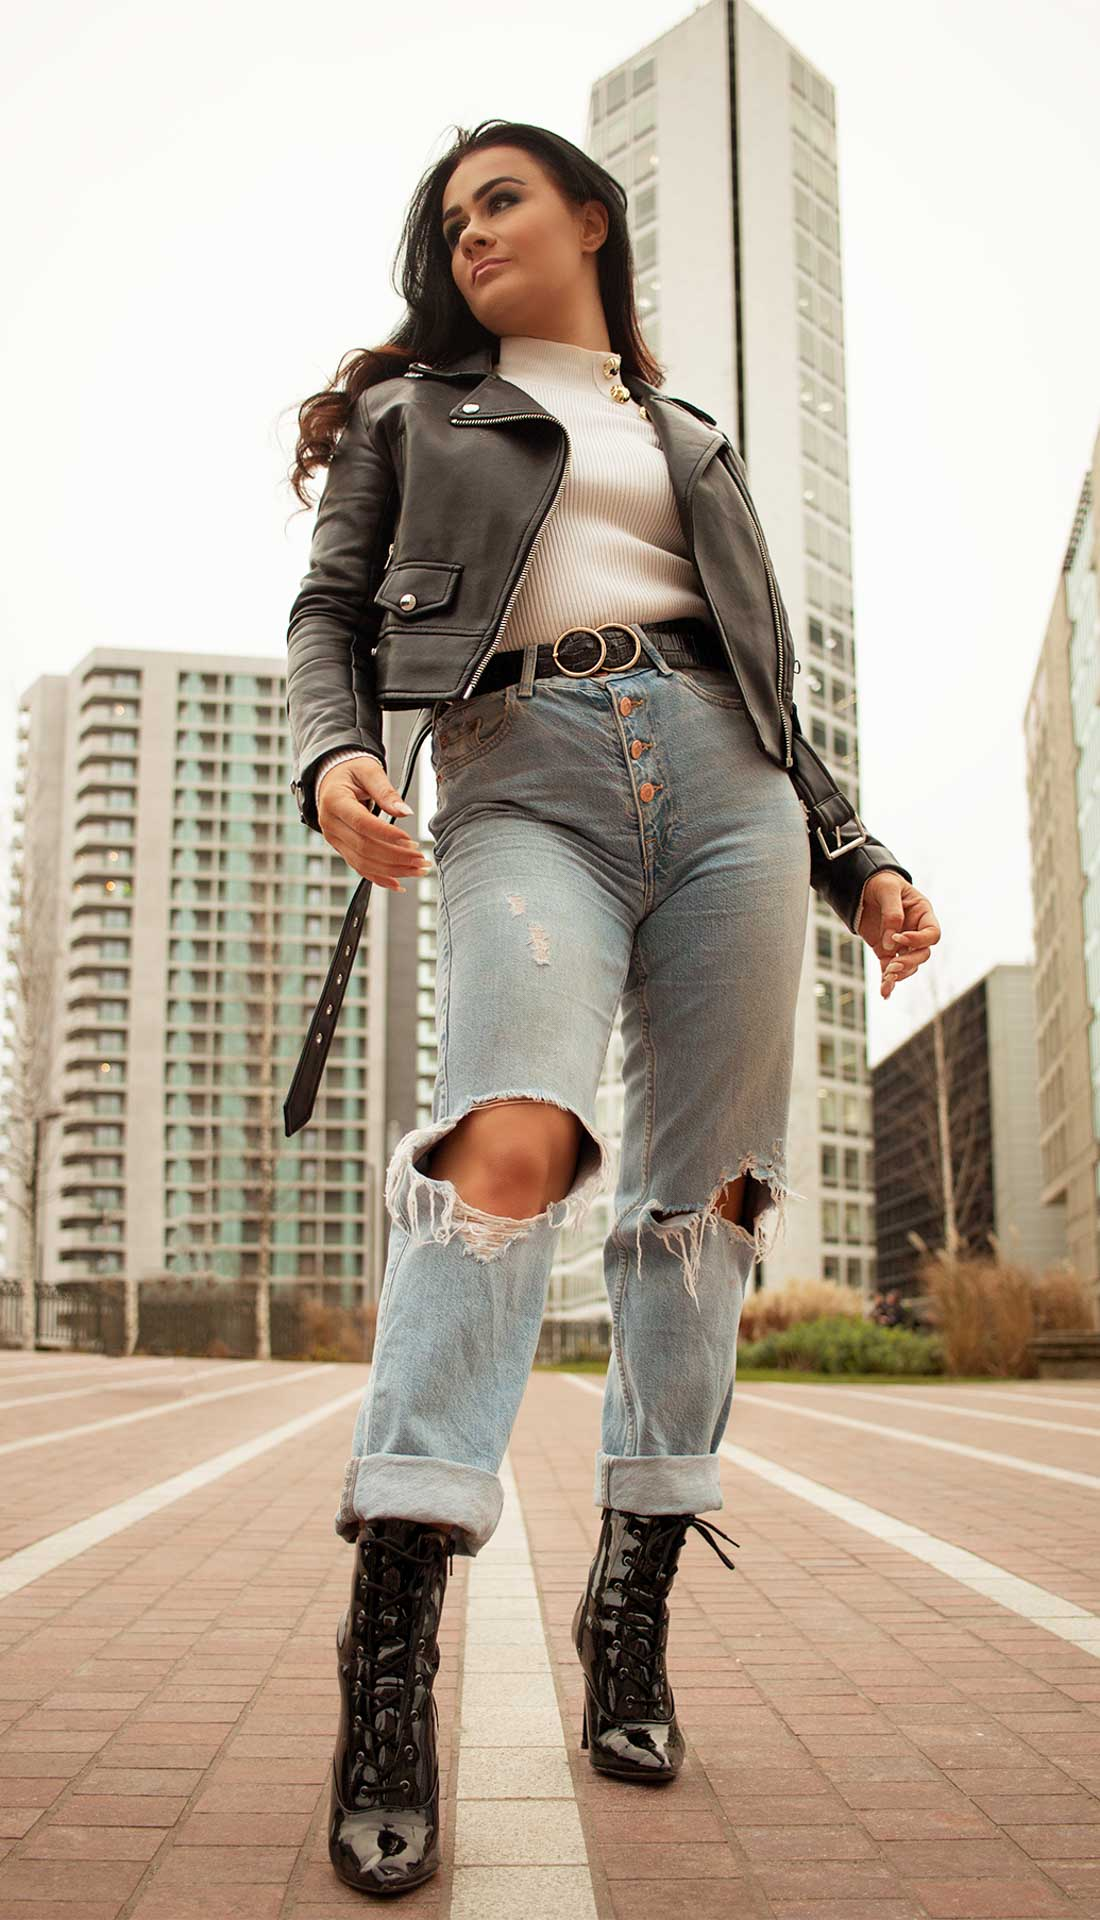 Birmingham street fashion photoshoot, women casual fashion, Birmingham U.K. fashion and commercial photographer